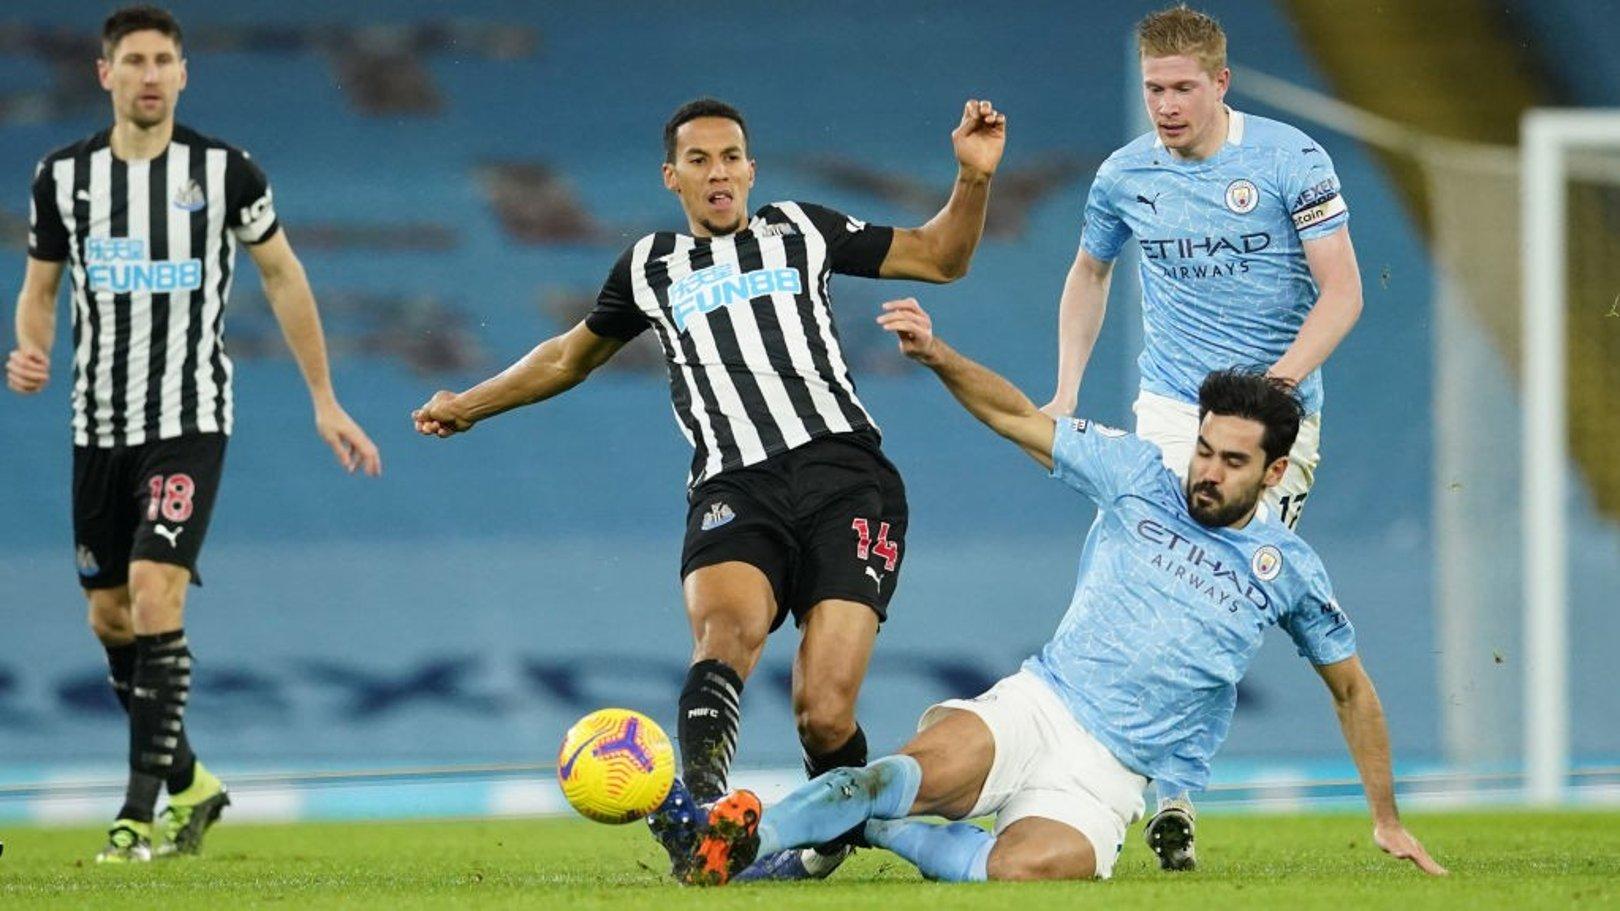 Where can I watch Newcastle v City?